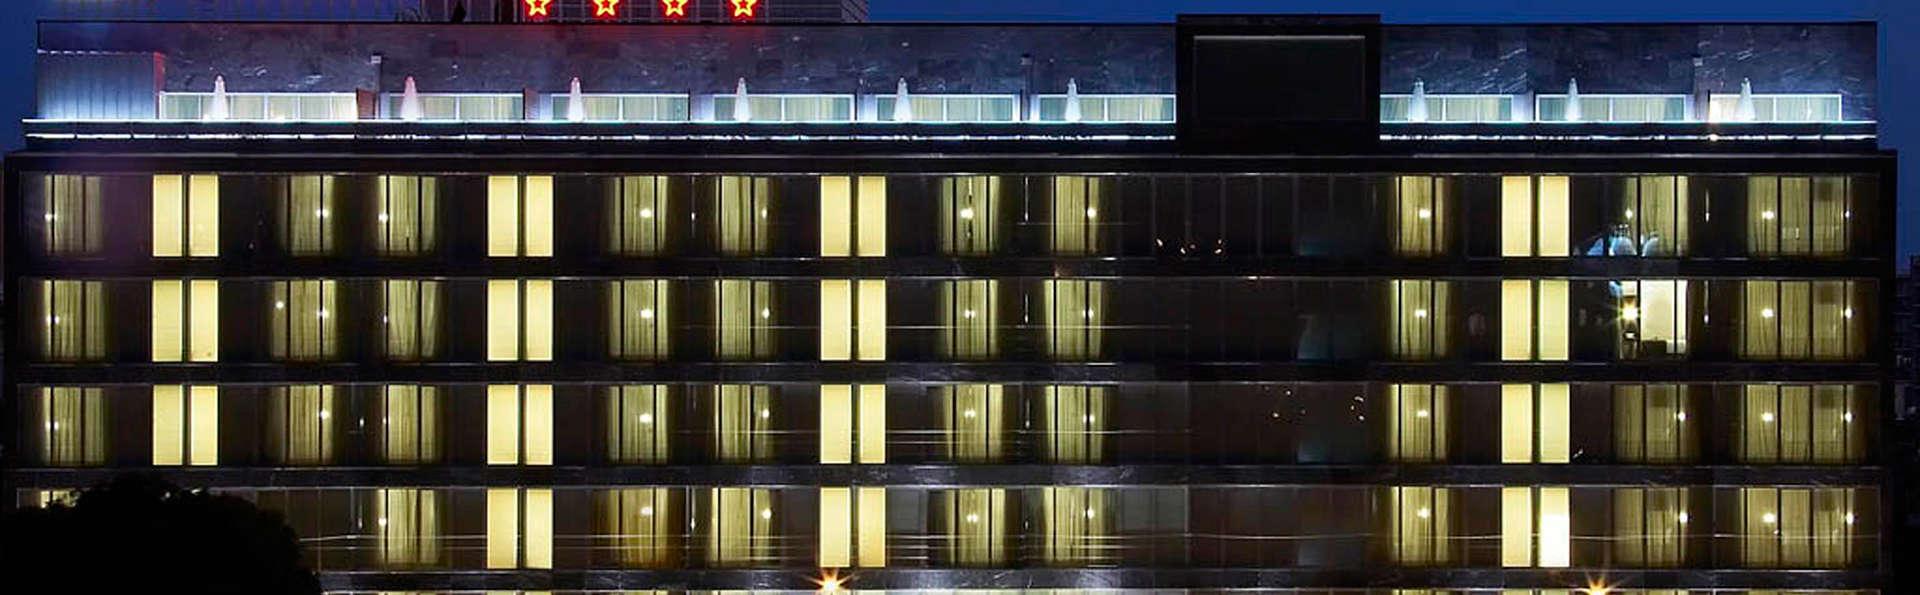 Hotel Bessa Boavista Porto by Ymspyra  - EDIT_front.jpg